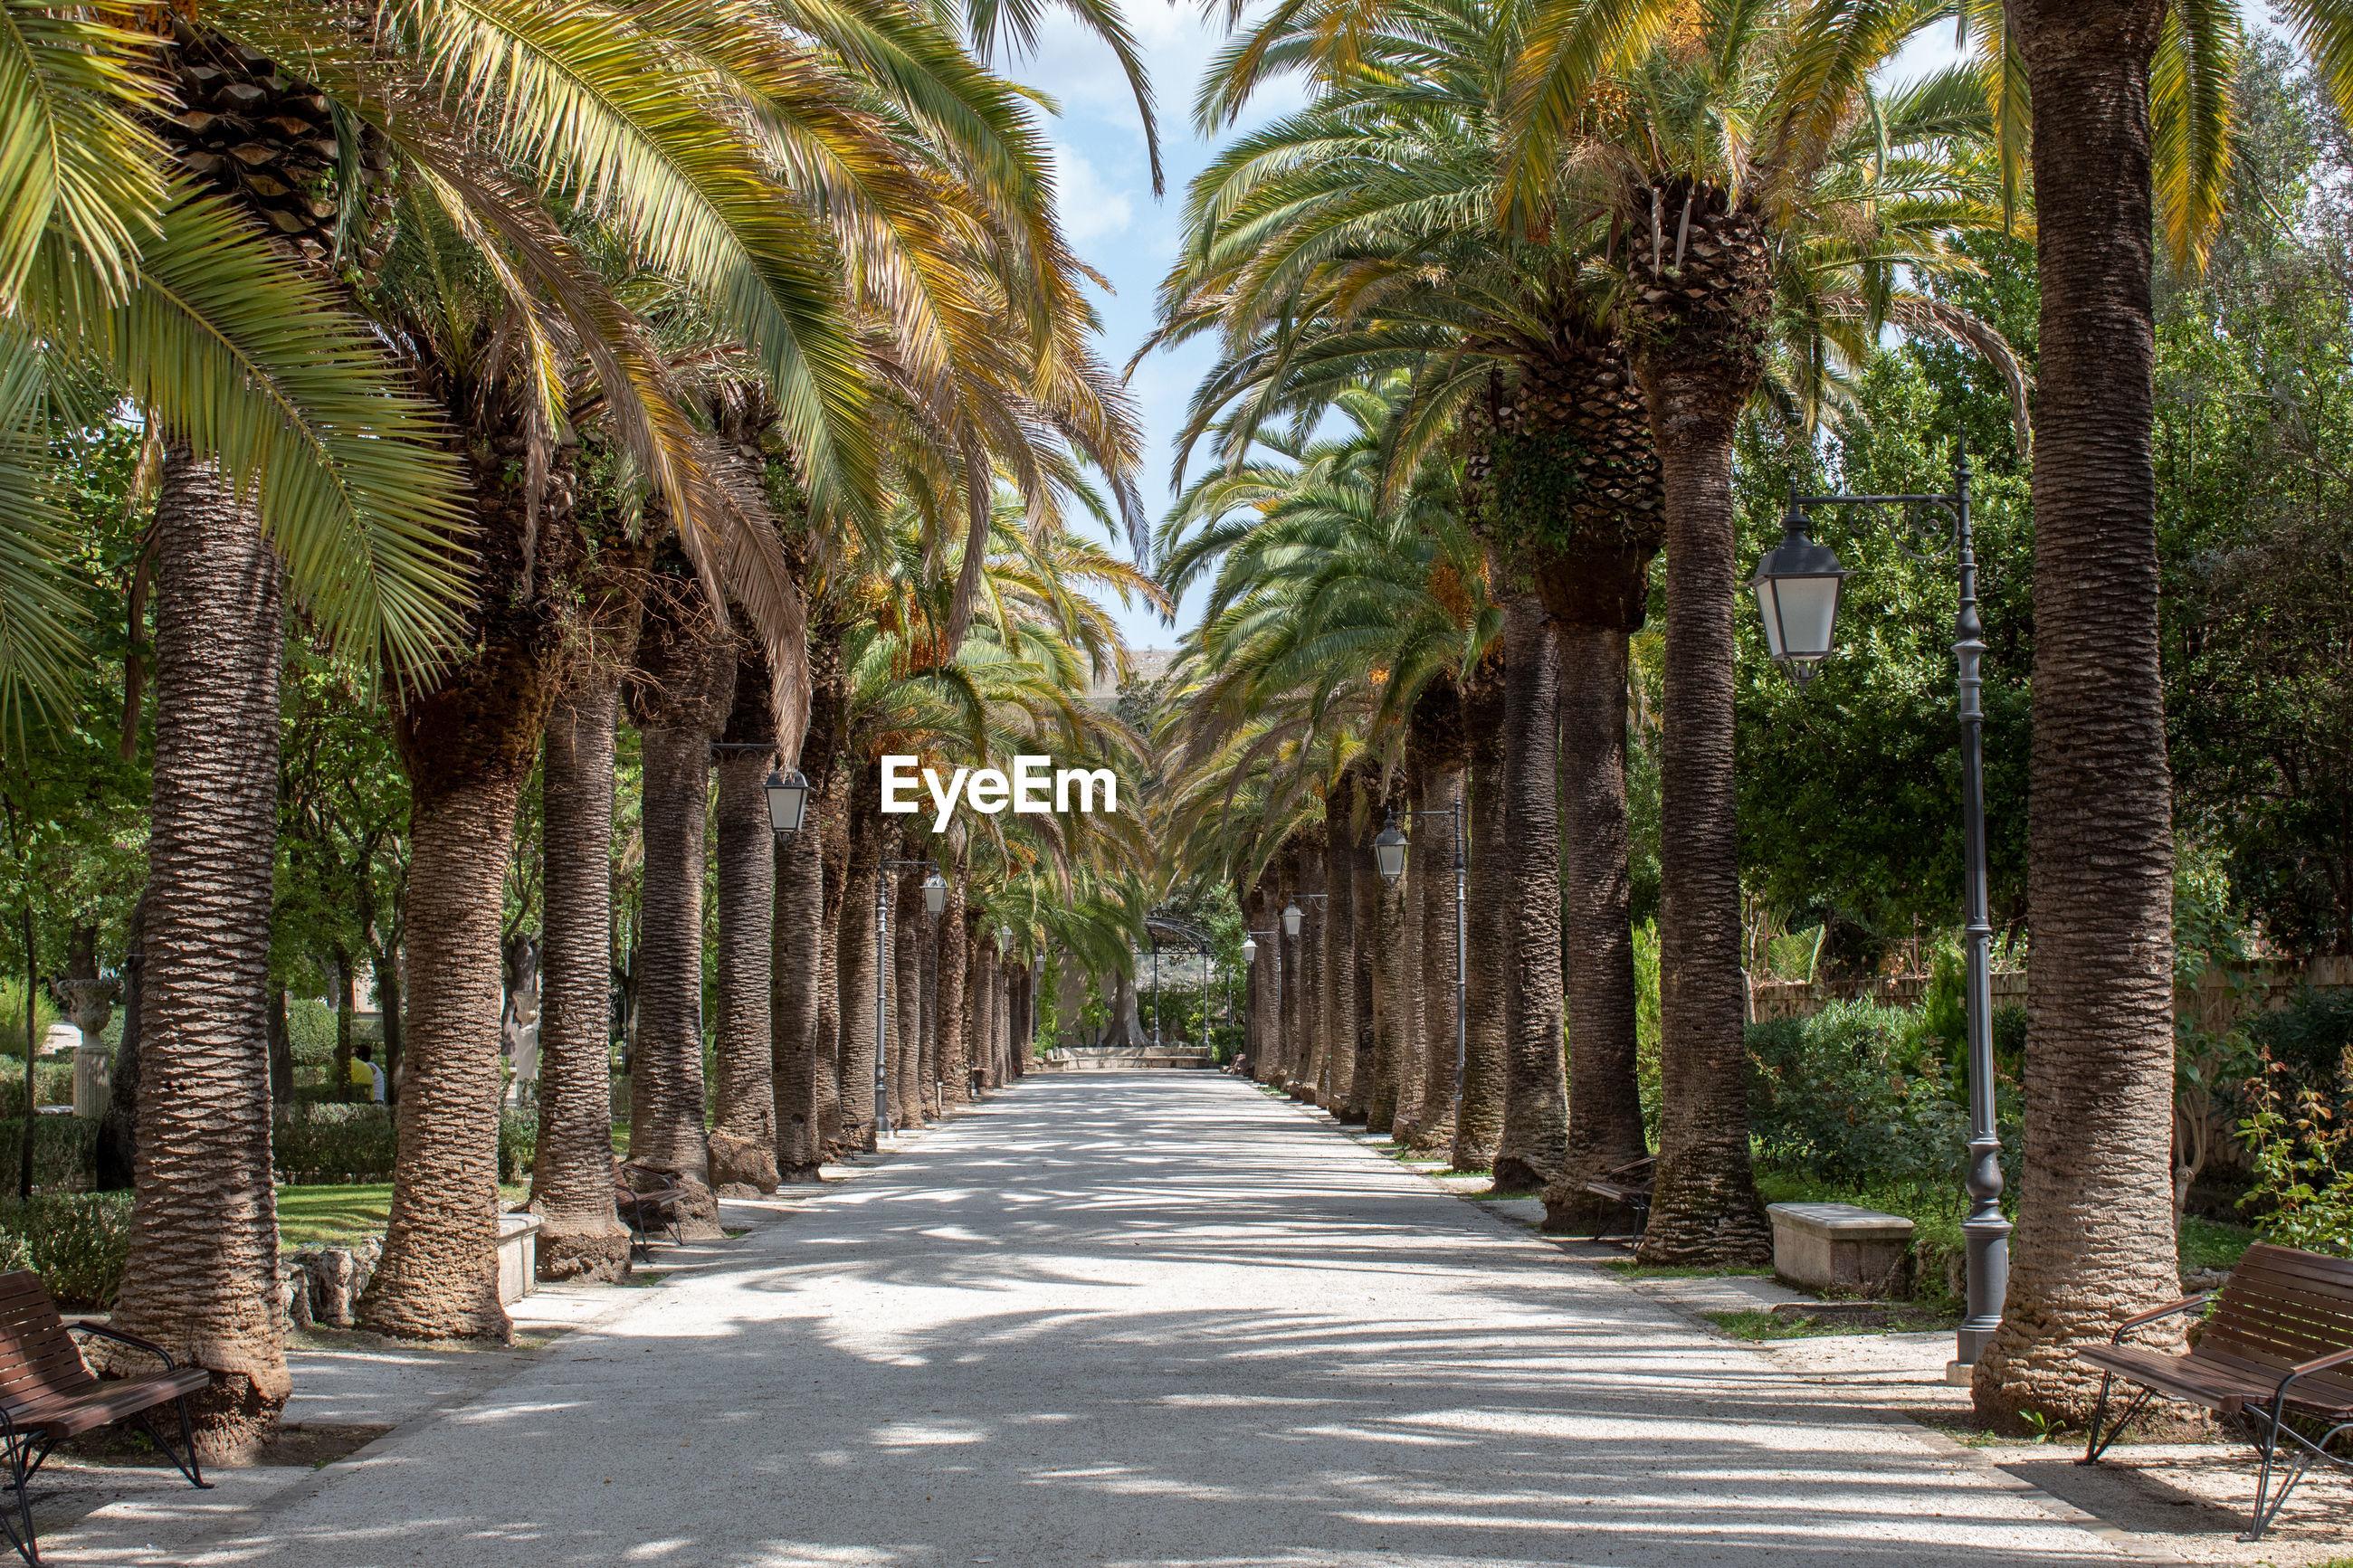 The main street of the villa in ragusa ibla